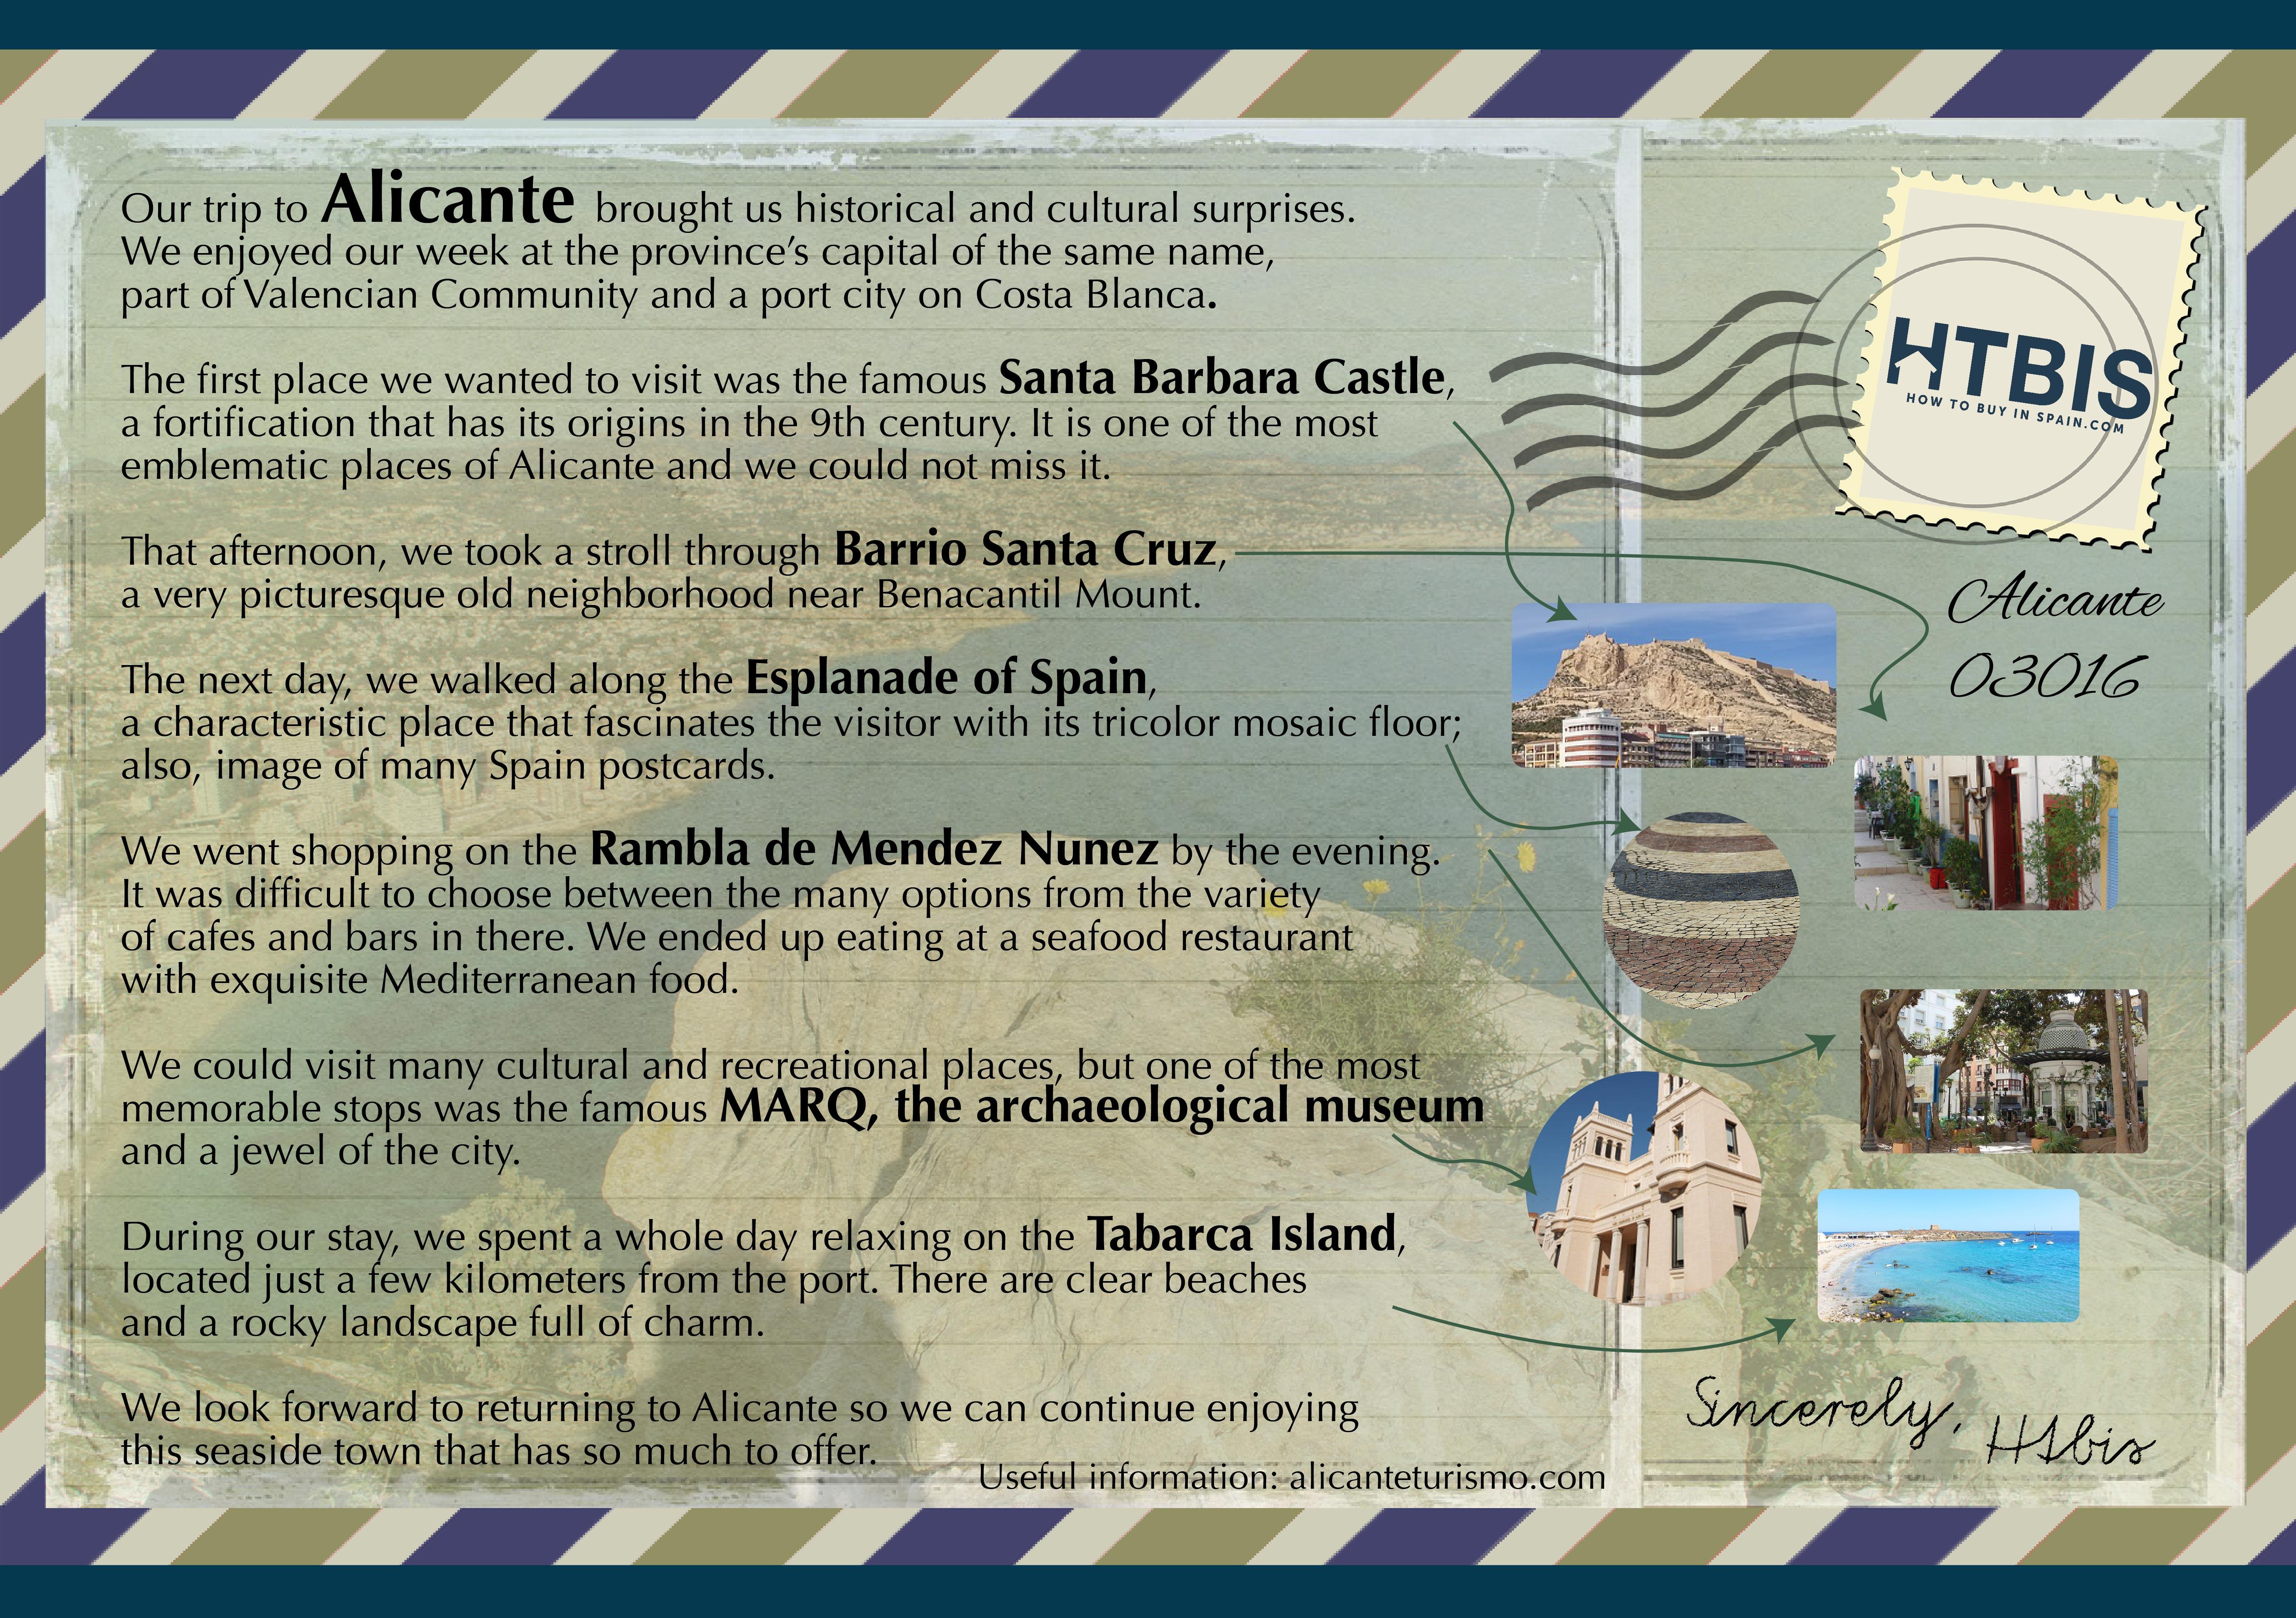 Alicante Citytrip ePostcard